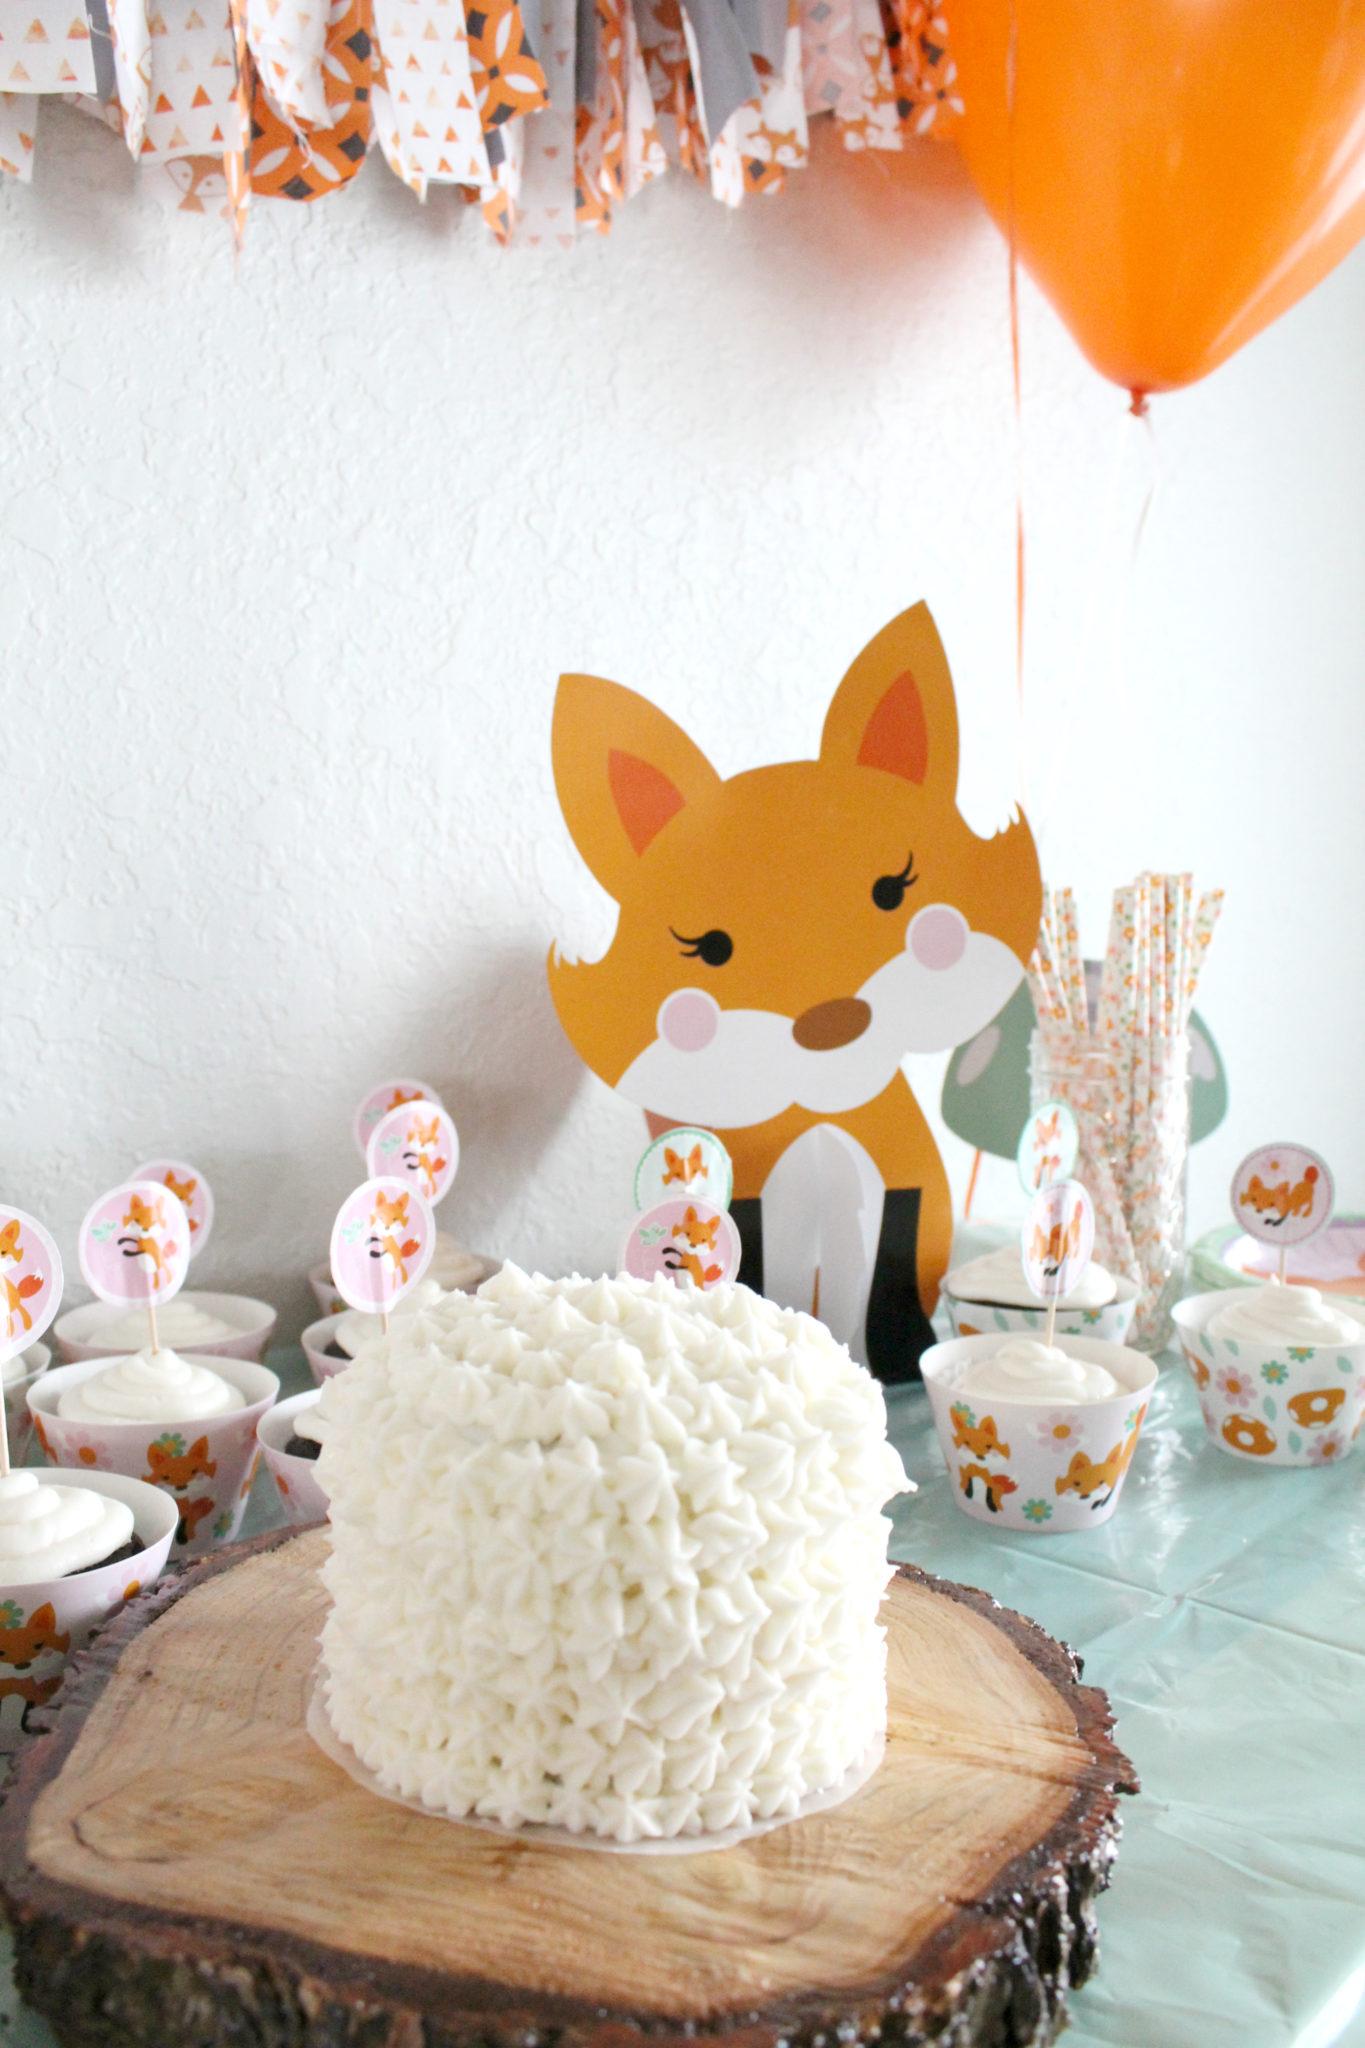 diy smash cake, easy vanilla cake recipe, homemade buttercream icing, first birthday